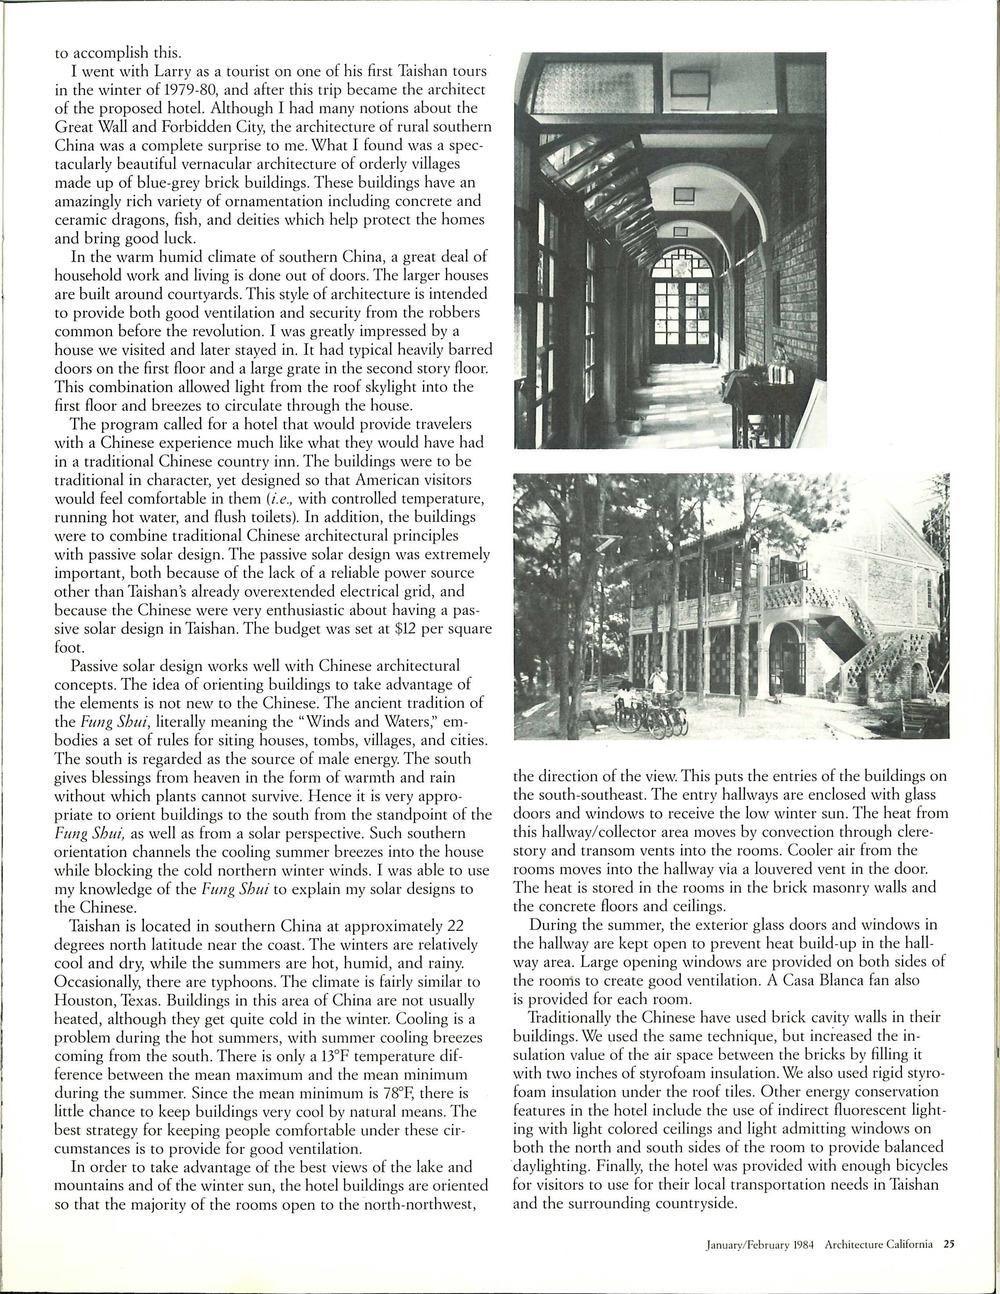 architecture california_1984_Page_5.jpg